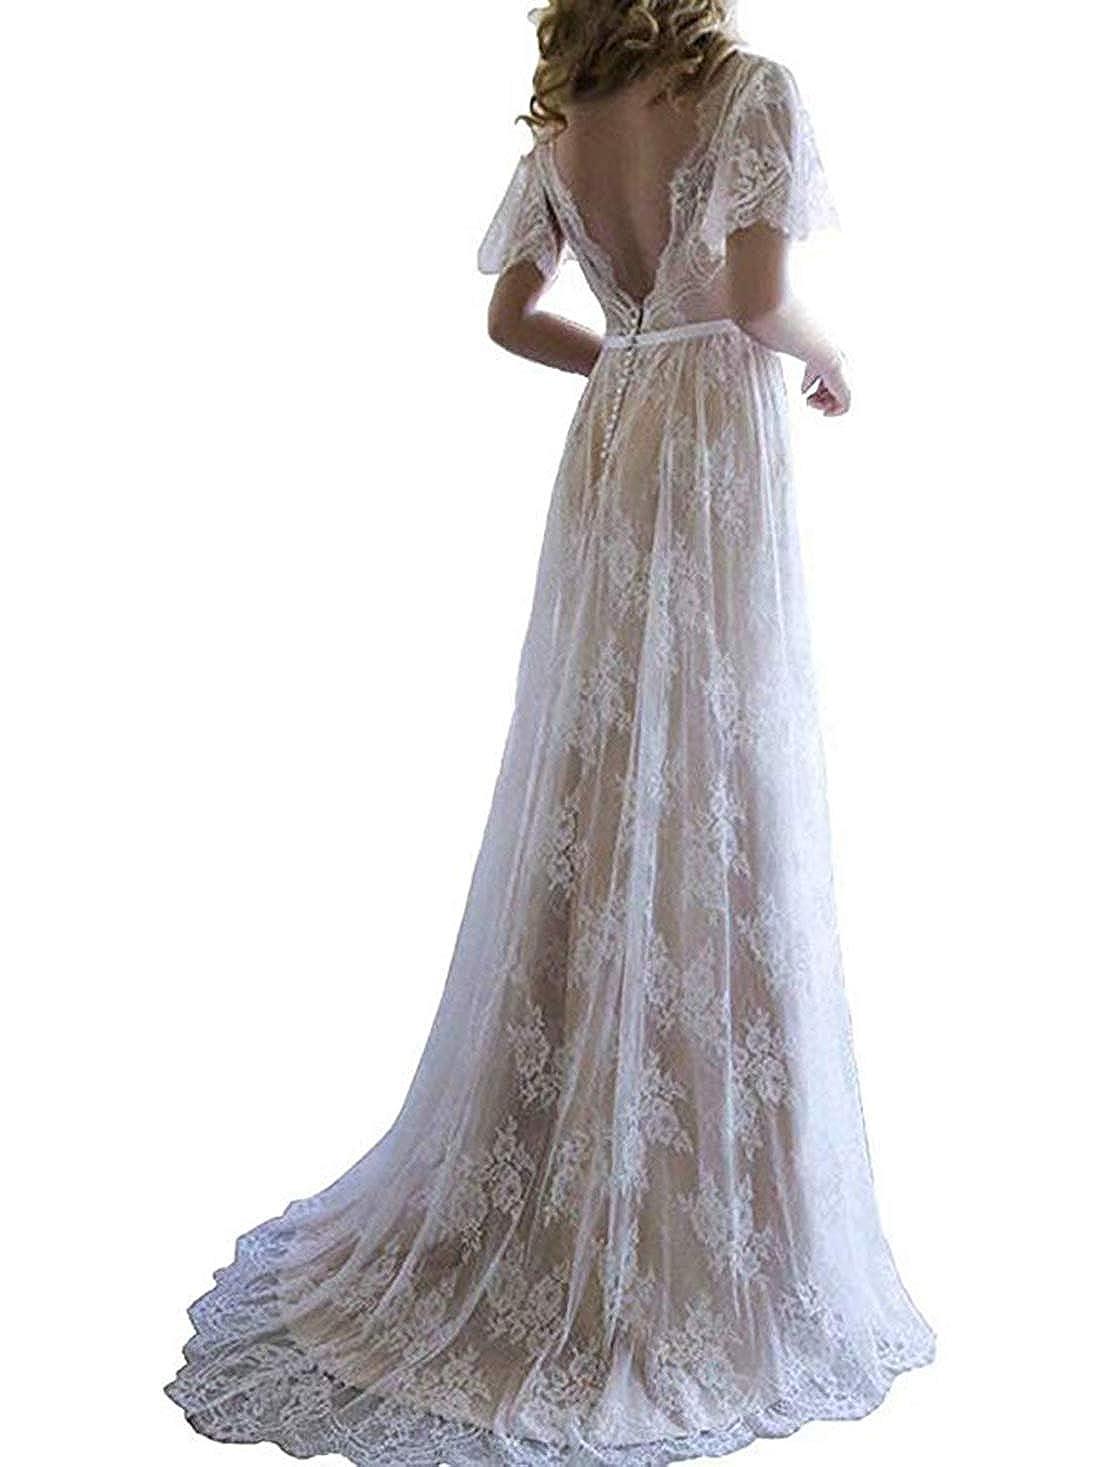 olise bridal Women's Romantic Boho Lace Beach Wedding Dresses V-Neck White Long Bridal Gown 2019 olise379